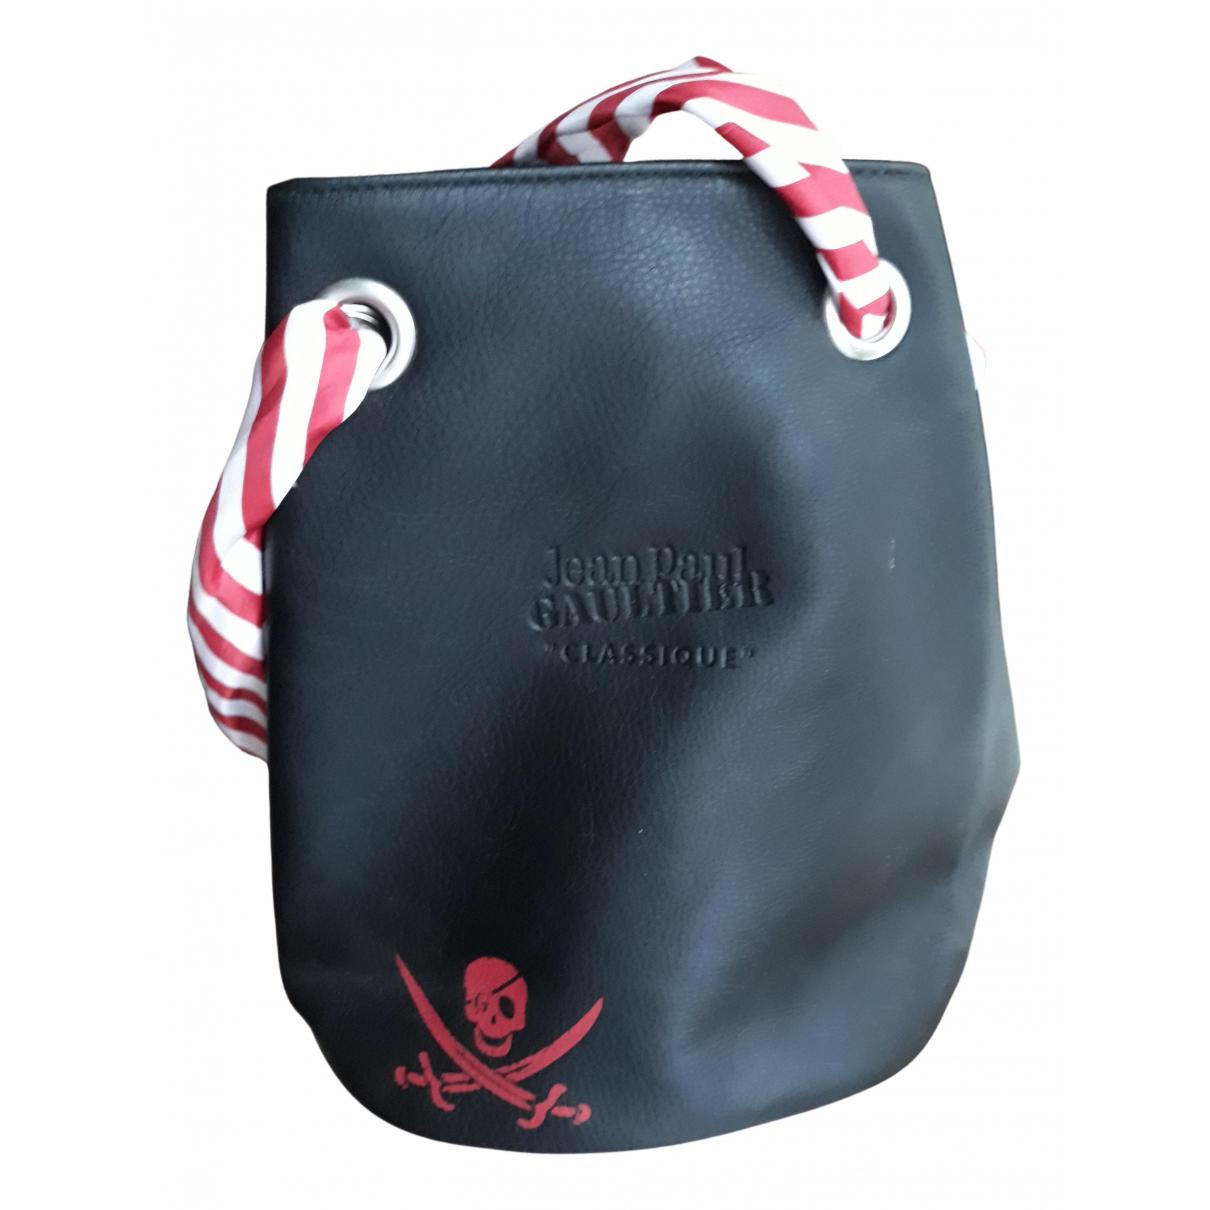 Jean Paul Gaultier \N Black handbag for Women \N